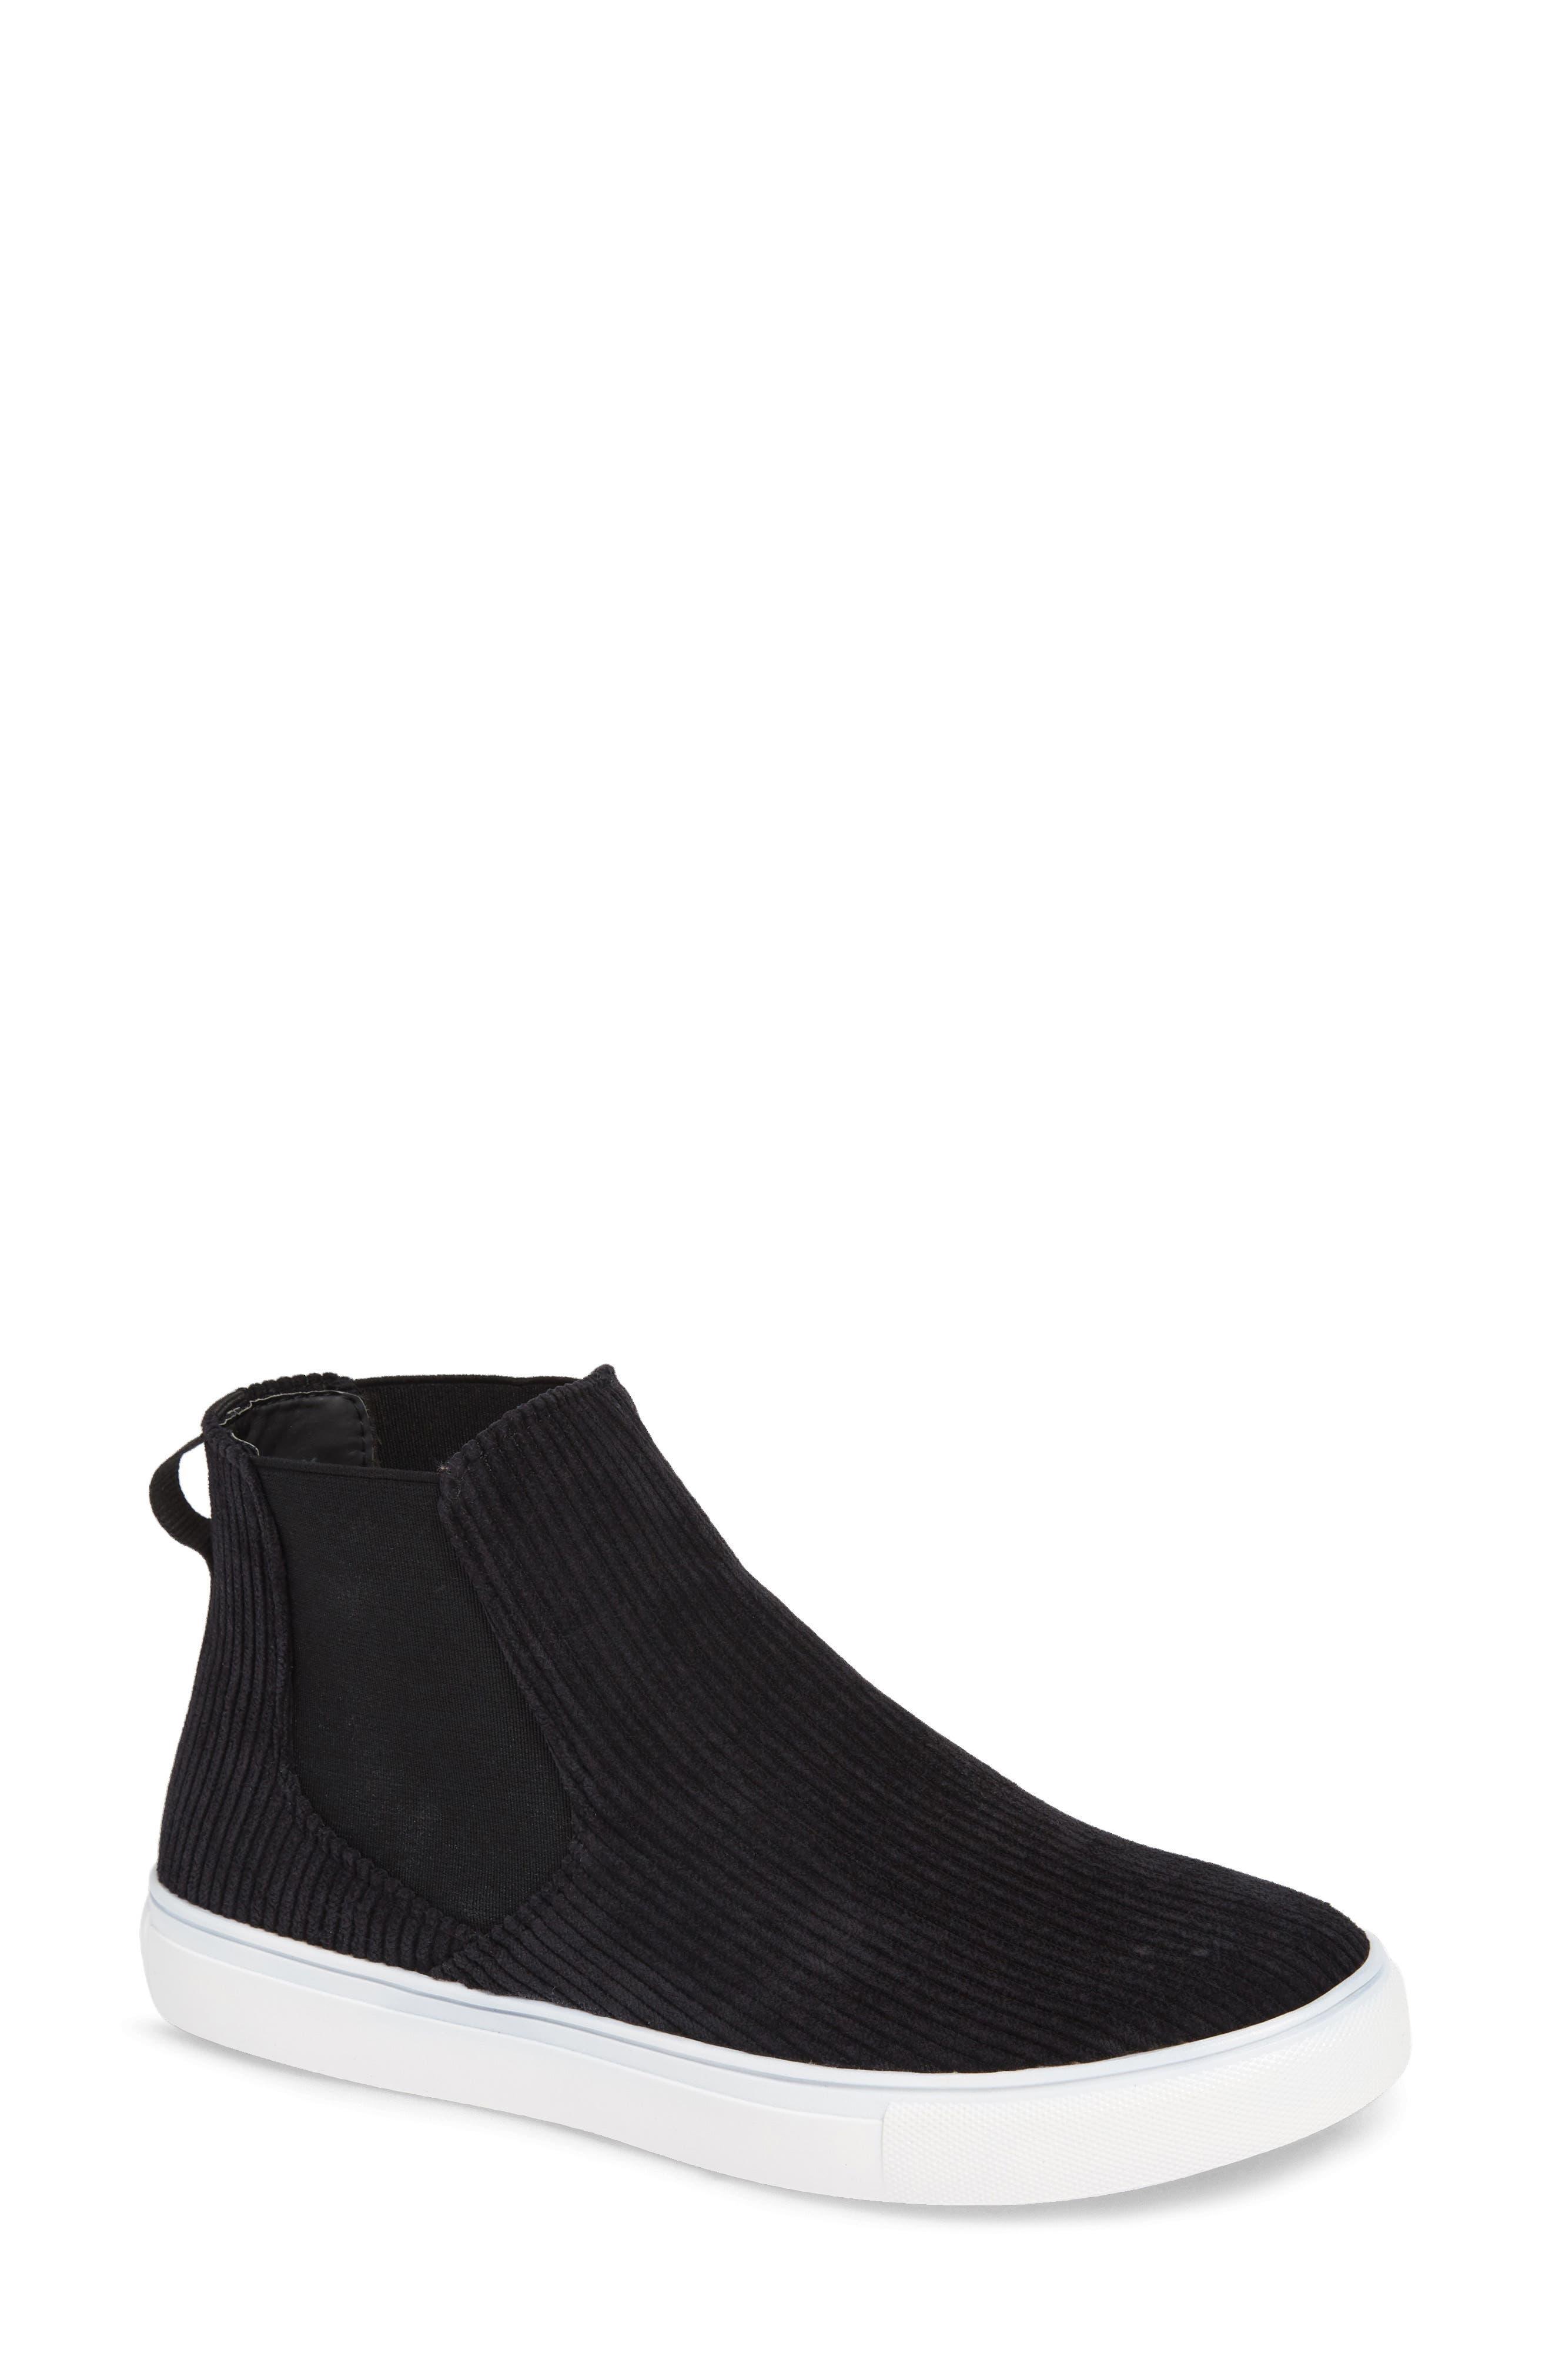 Stratford High Top Sneaker,                         Main,                         color, BLACK FABRIC